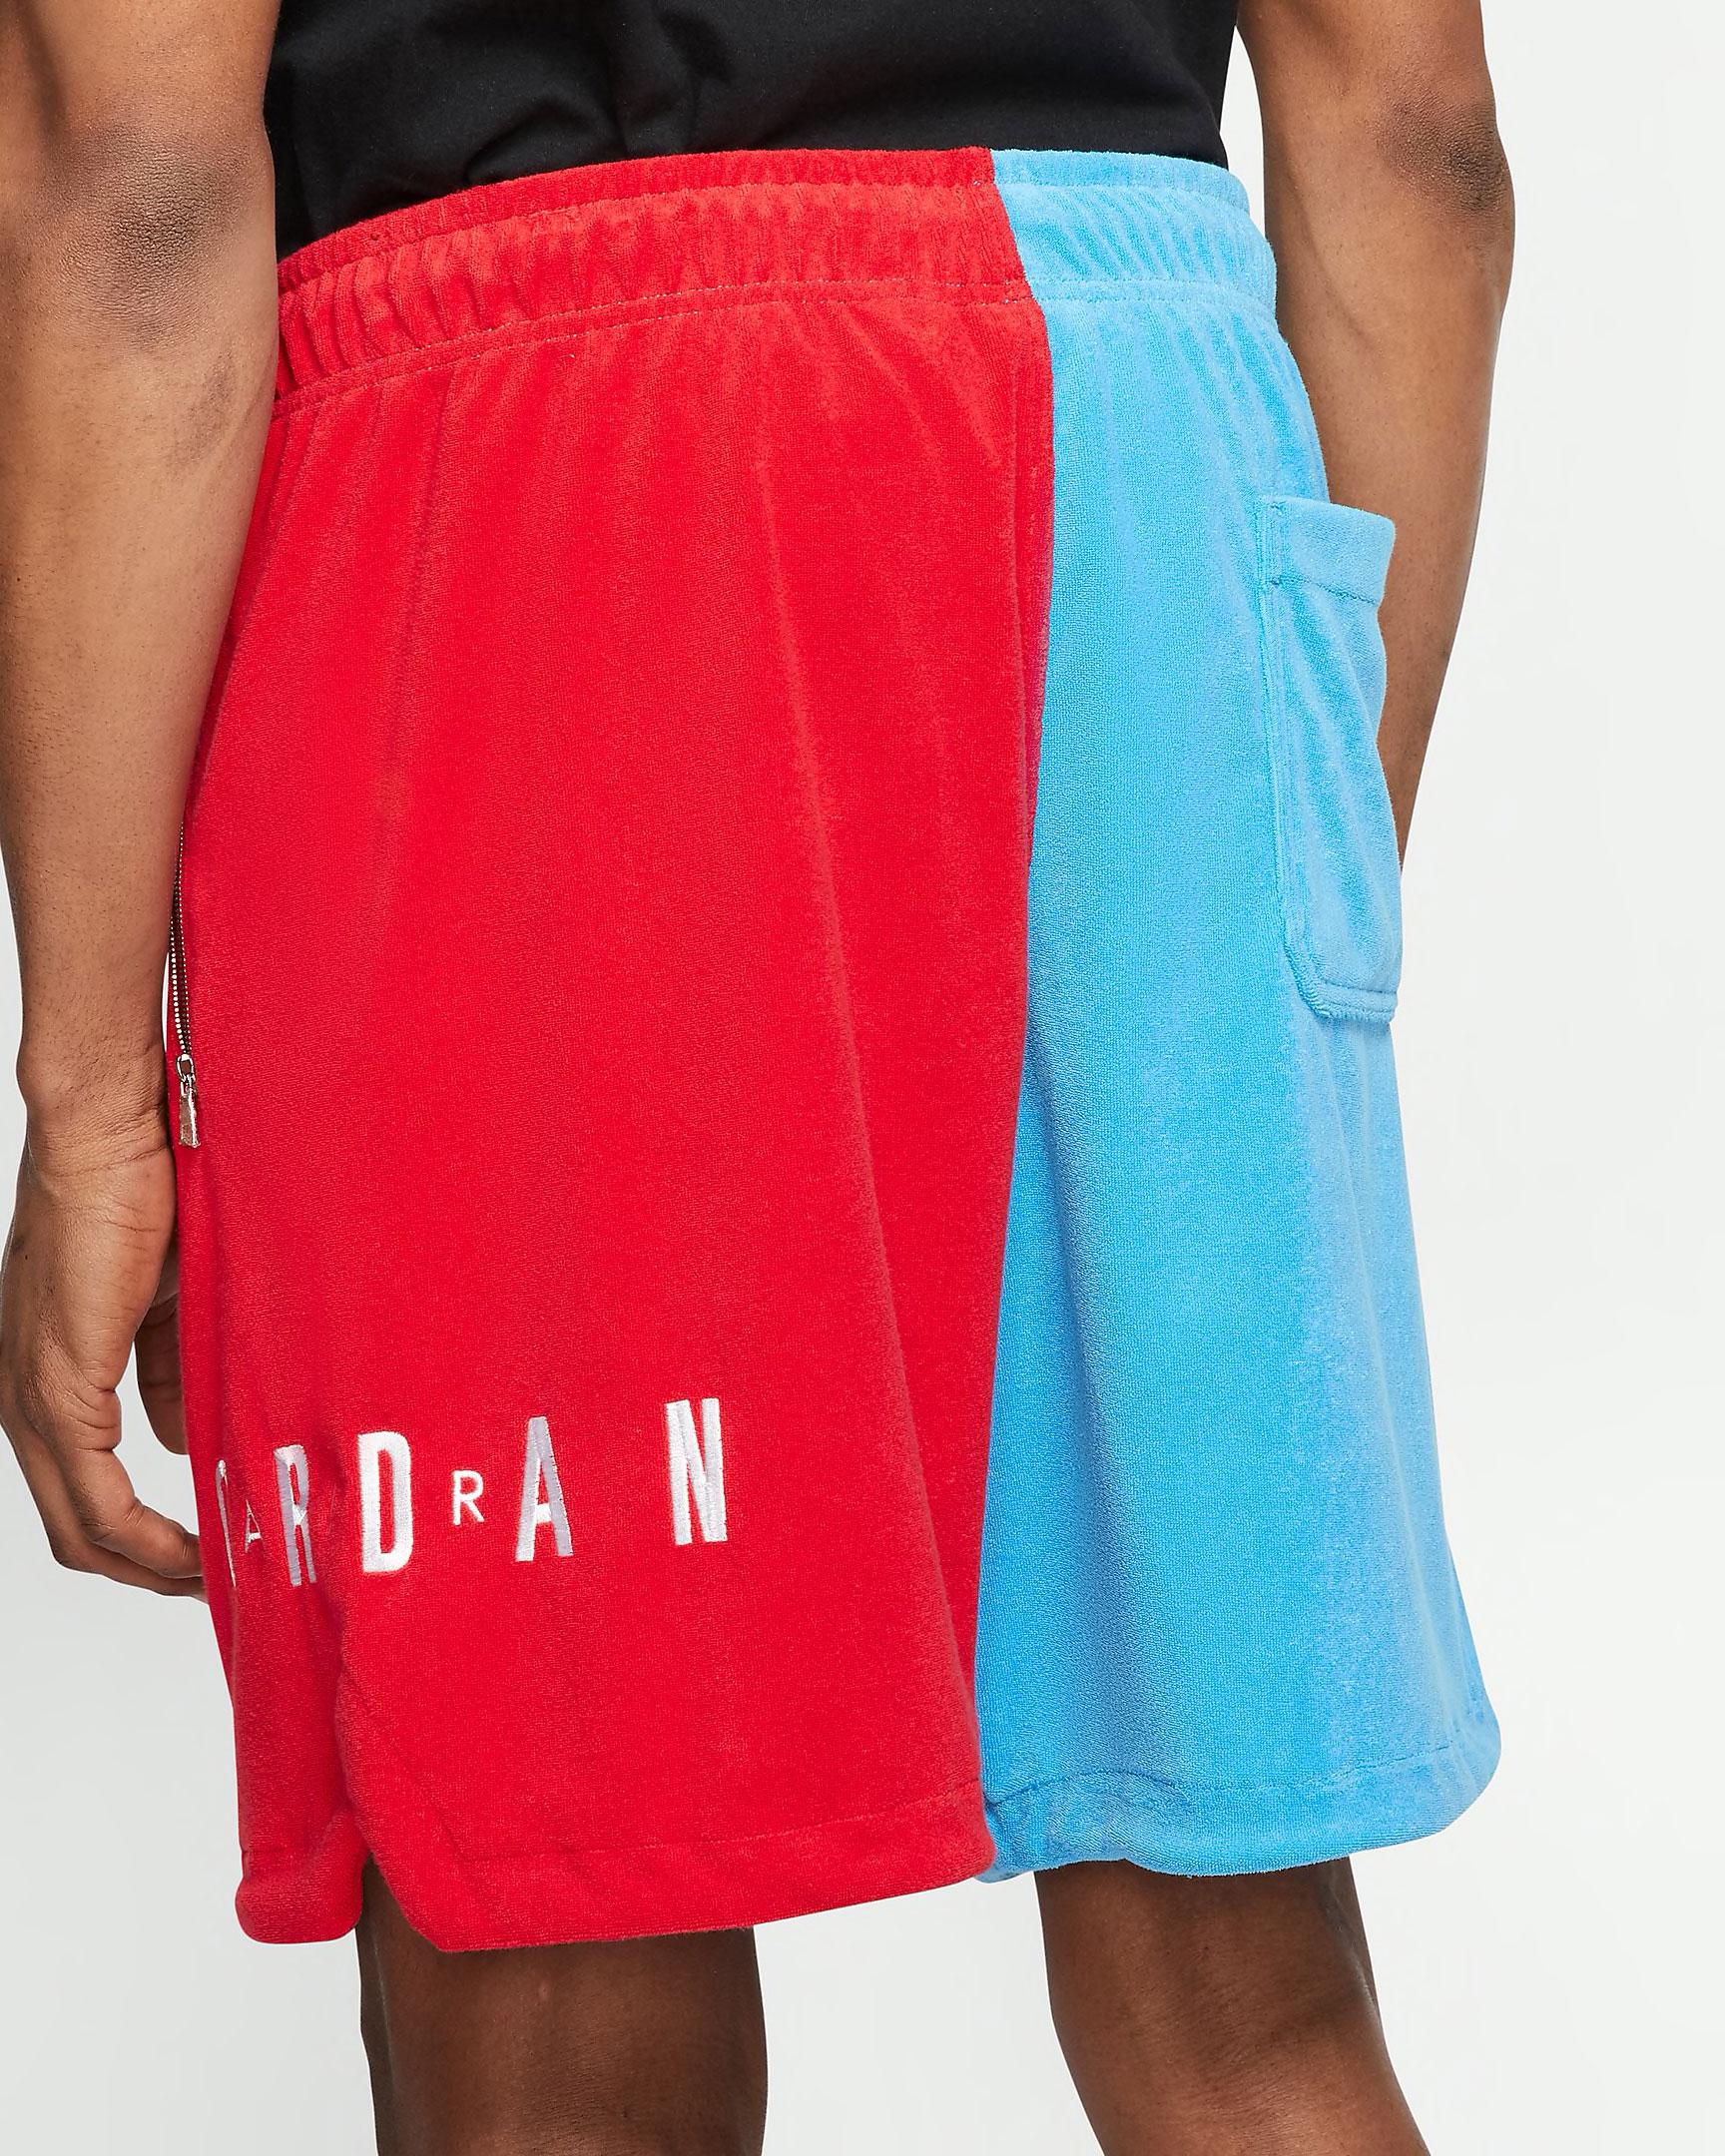 jordan-unc-to-chicago-shorts-3